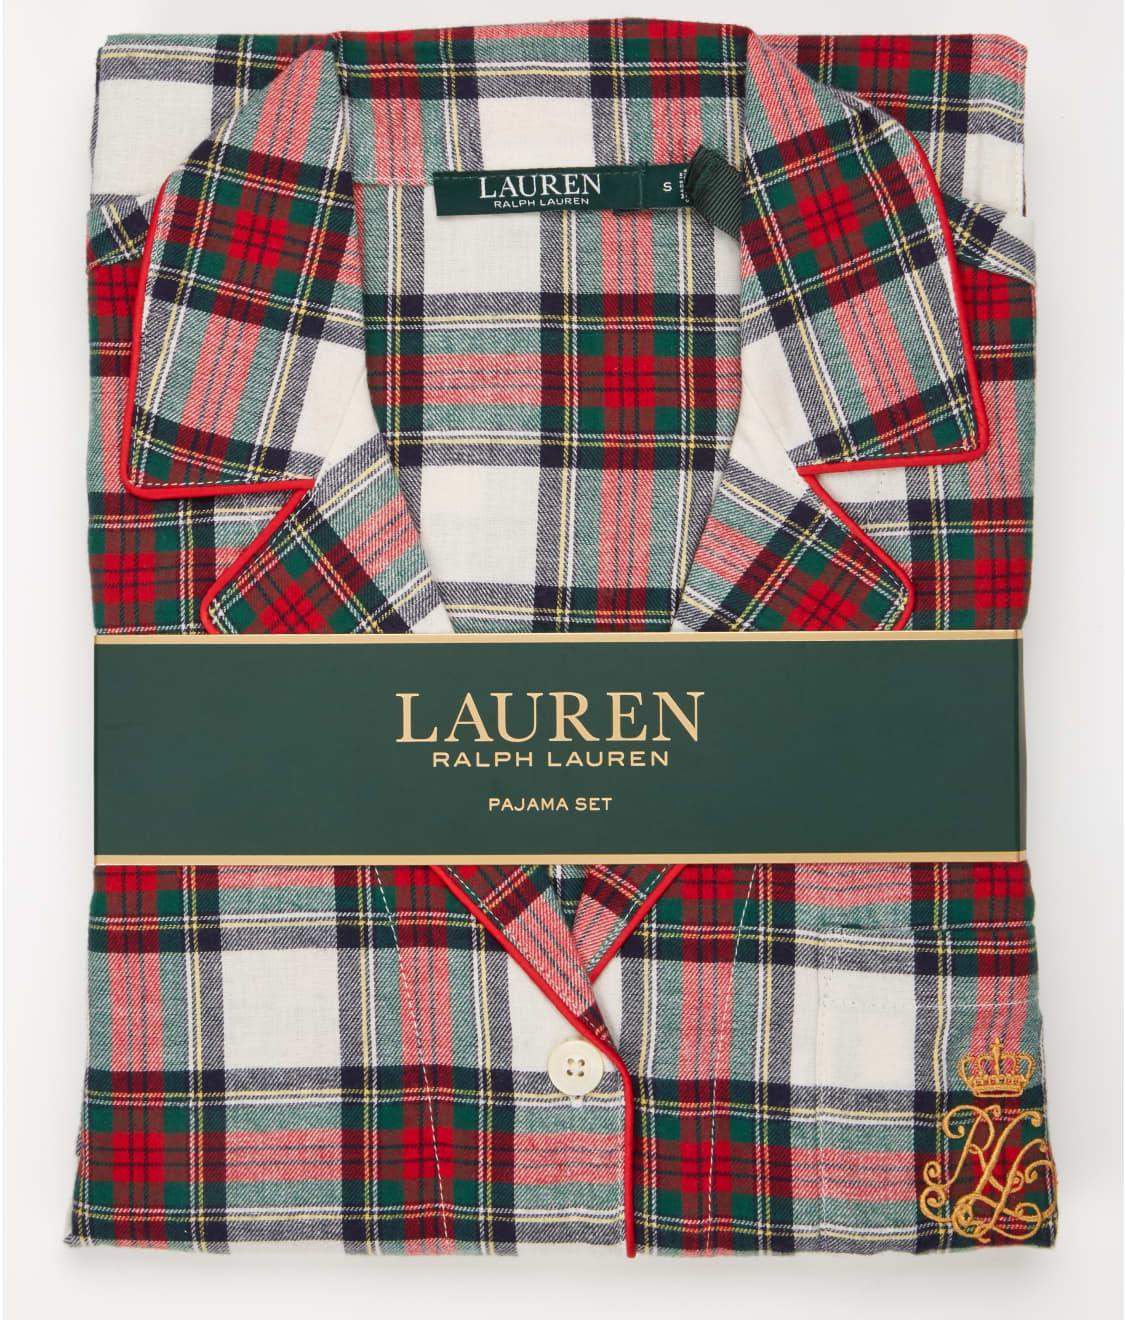 a57ad77c9a19d Lauren Ralph Lauren Classic Flannel Pajama Set